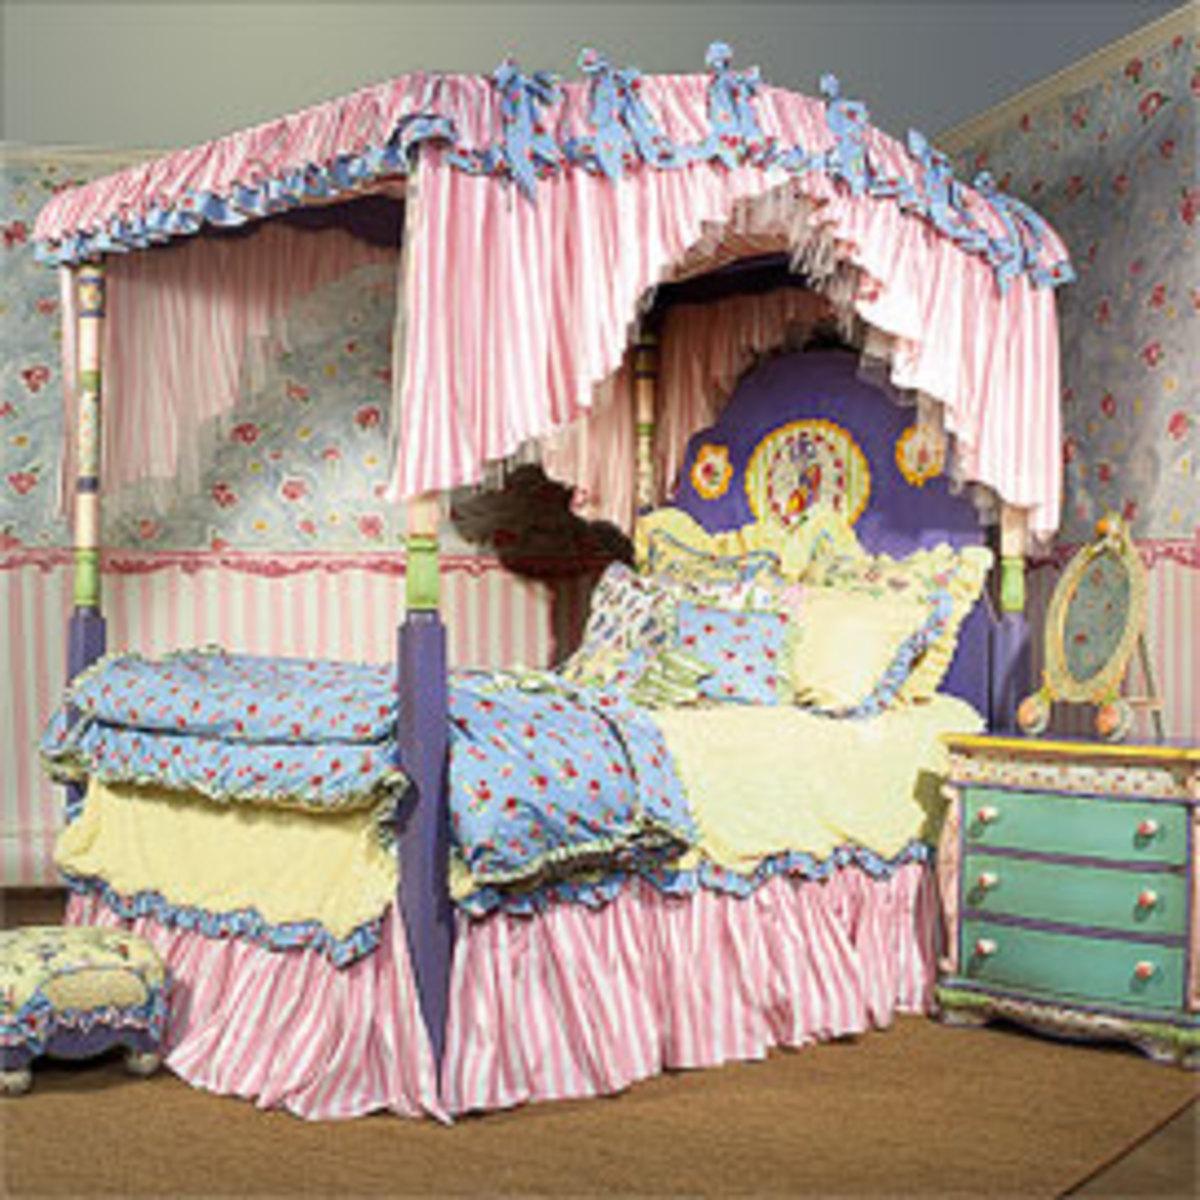 Divine Dress Up fantasy-themed bed